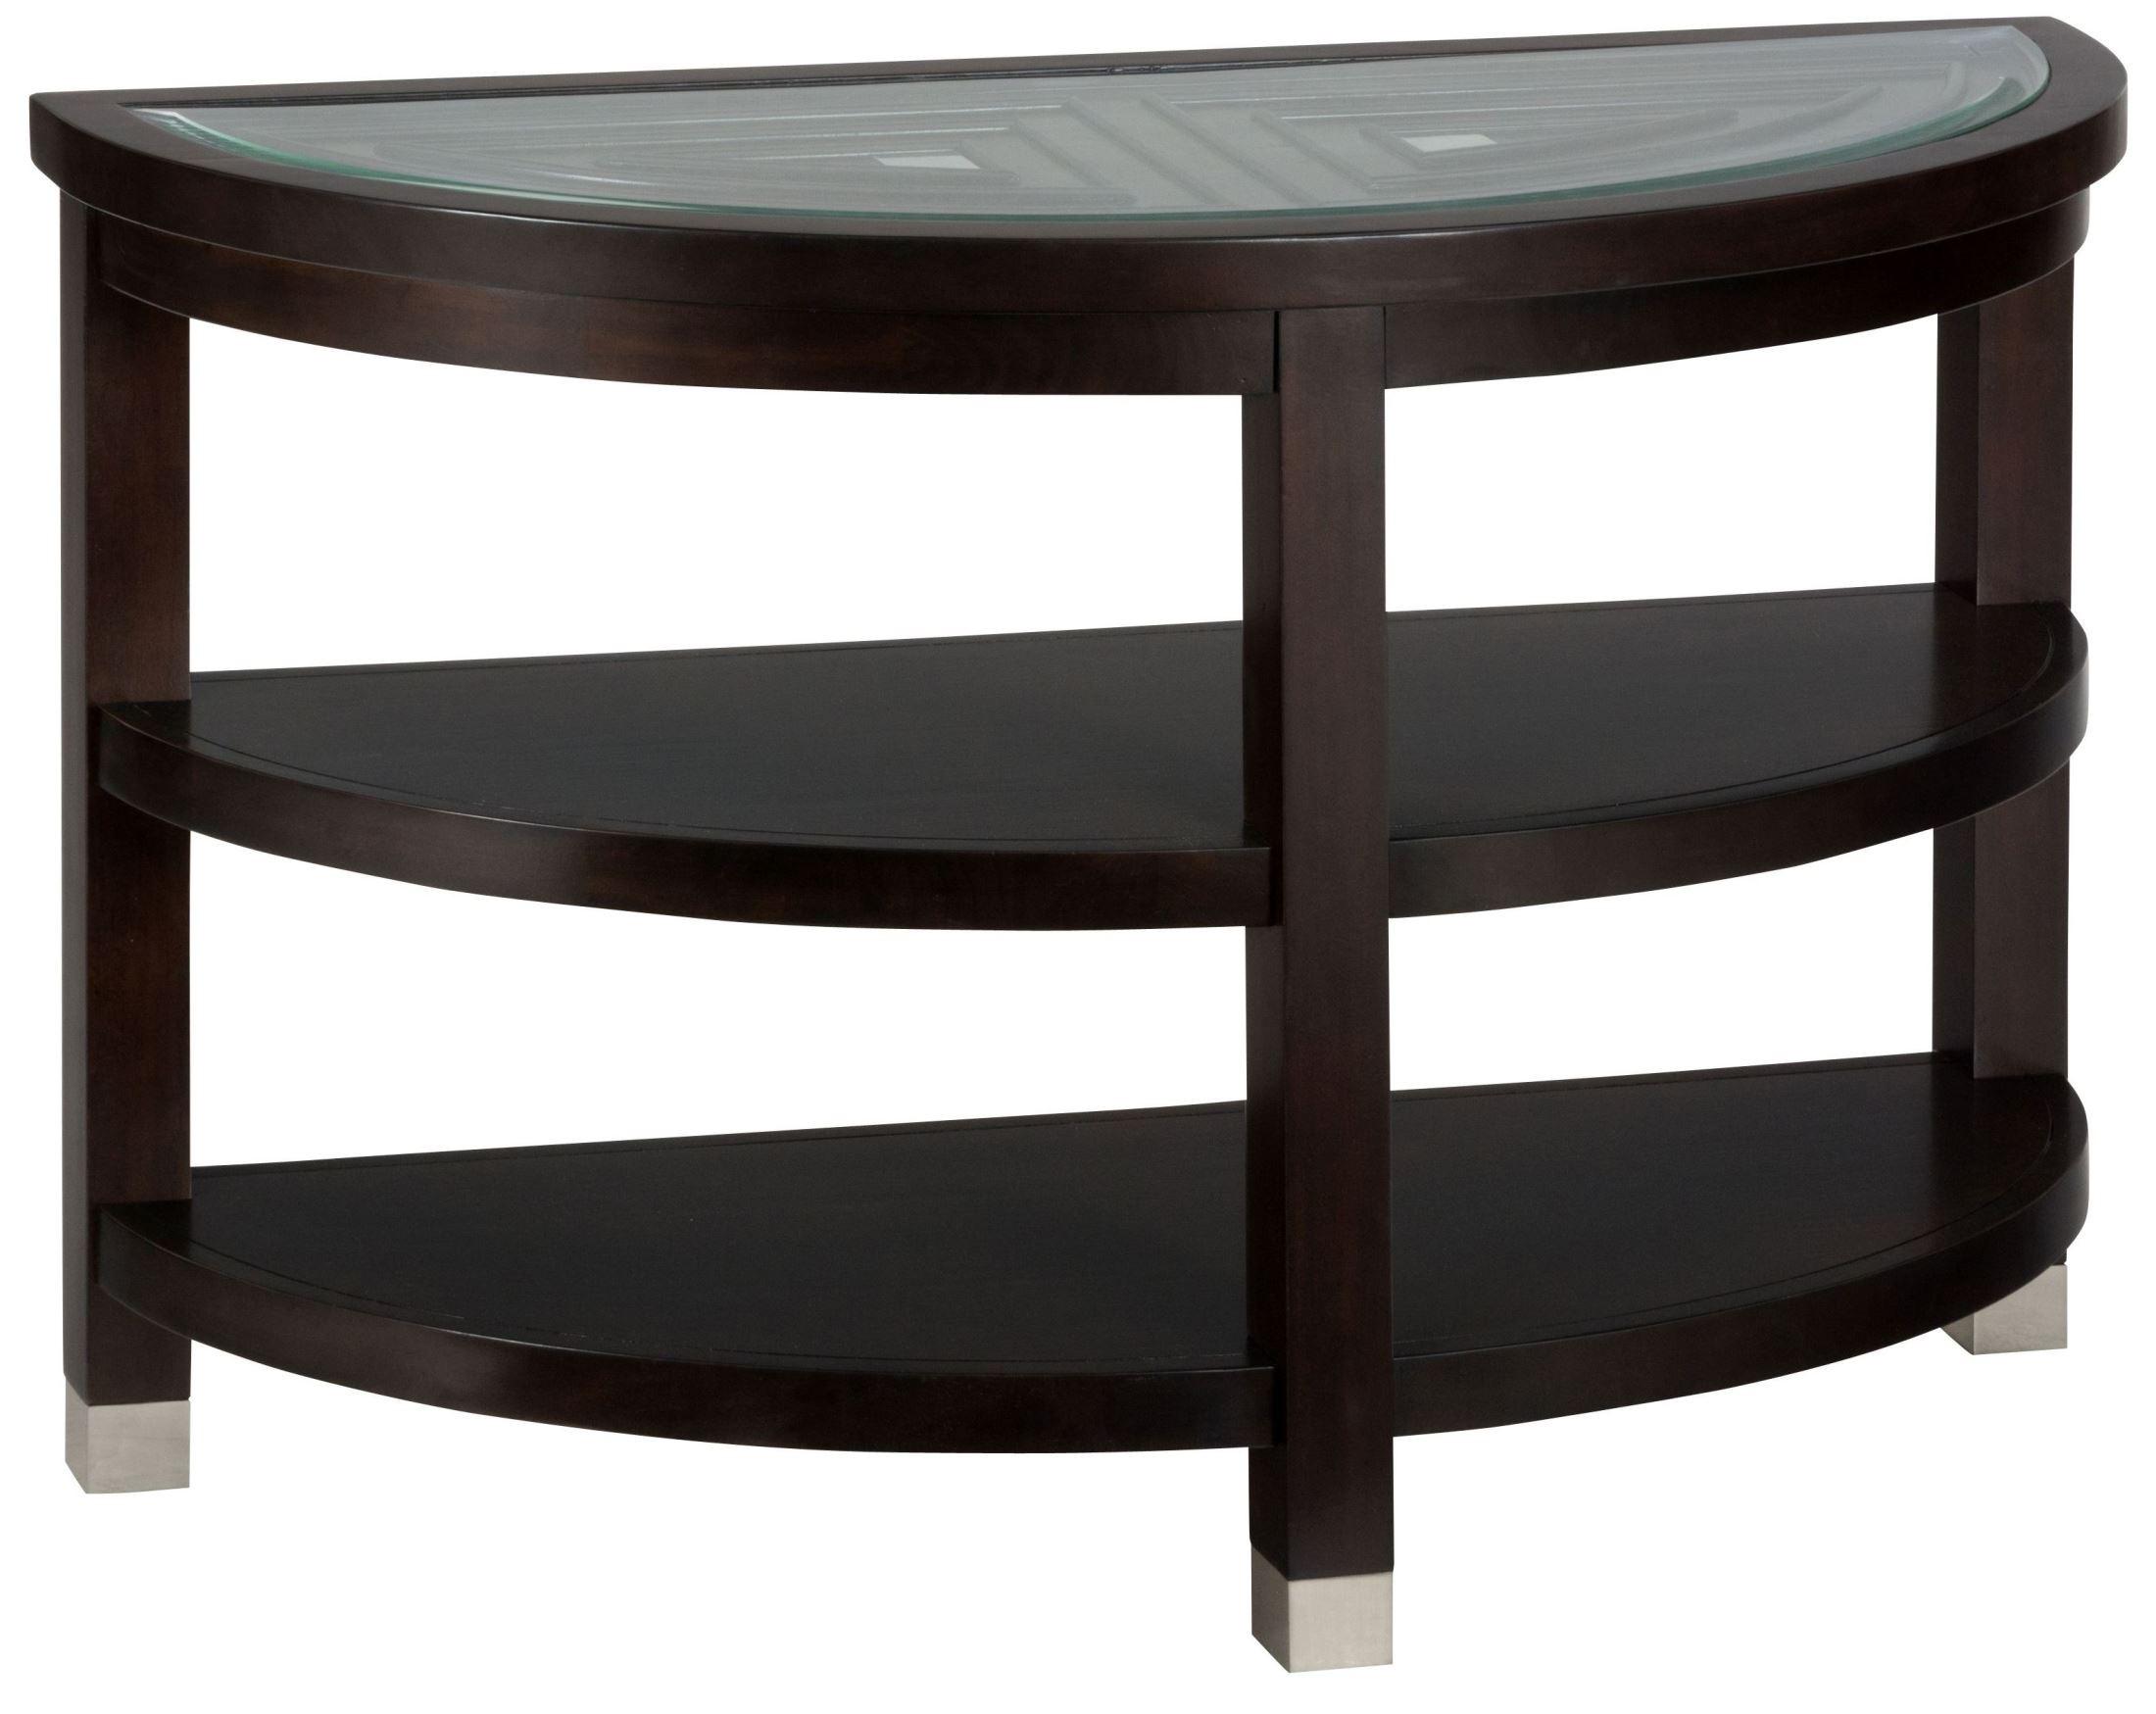 Warren sofa table from jofran coleman furniture